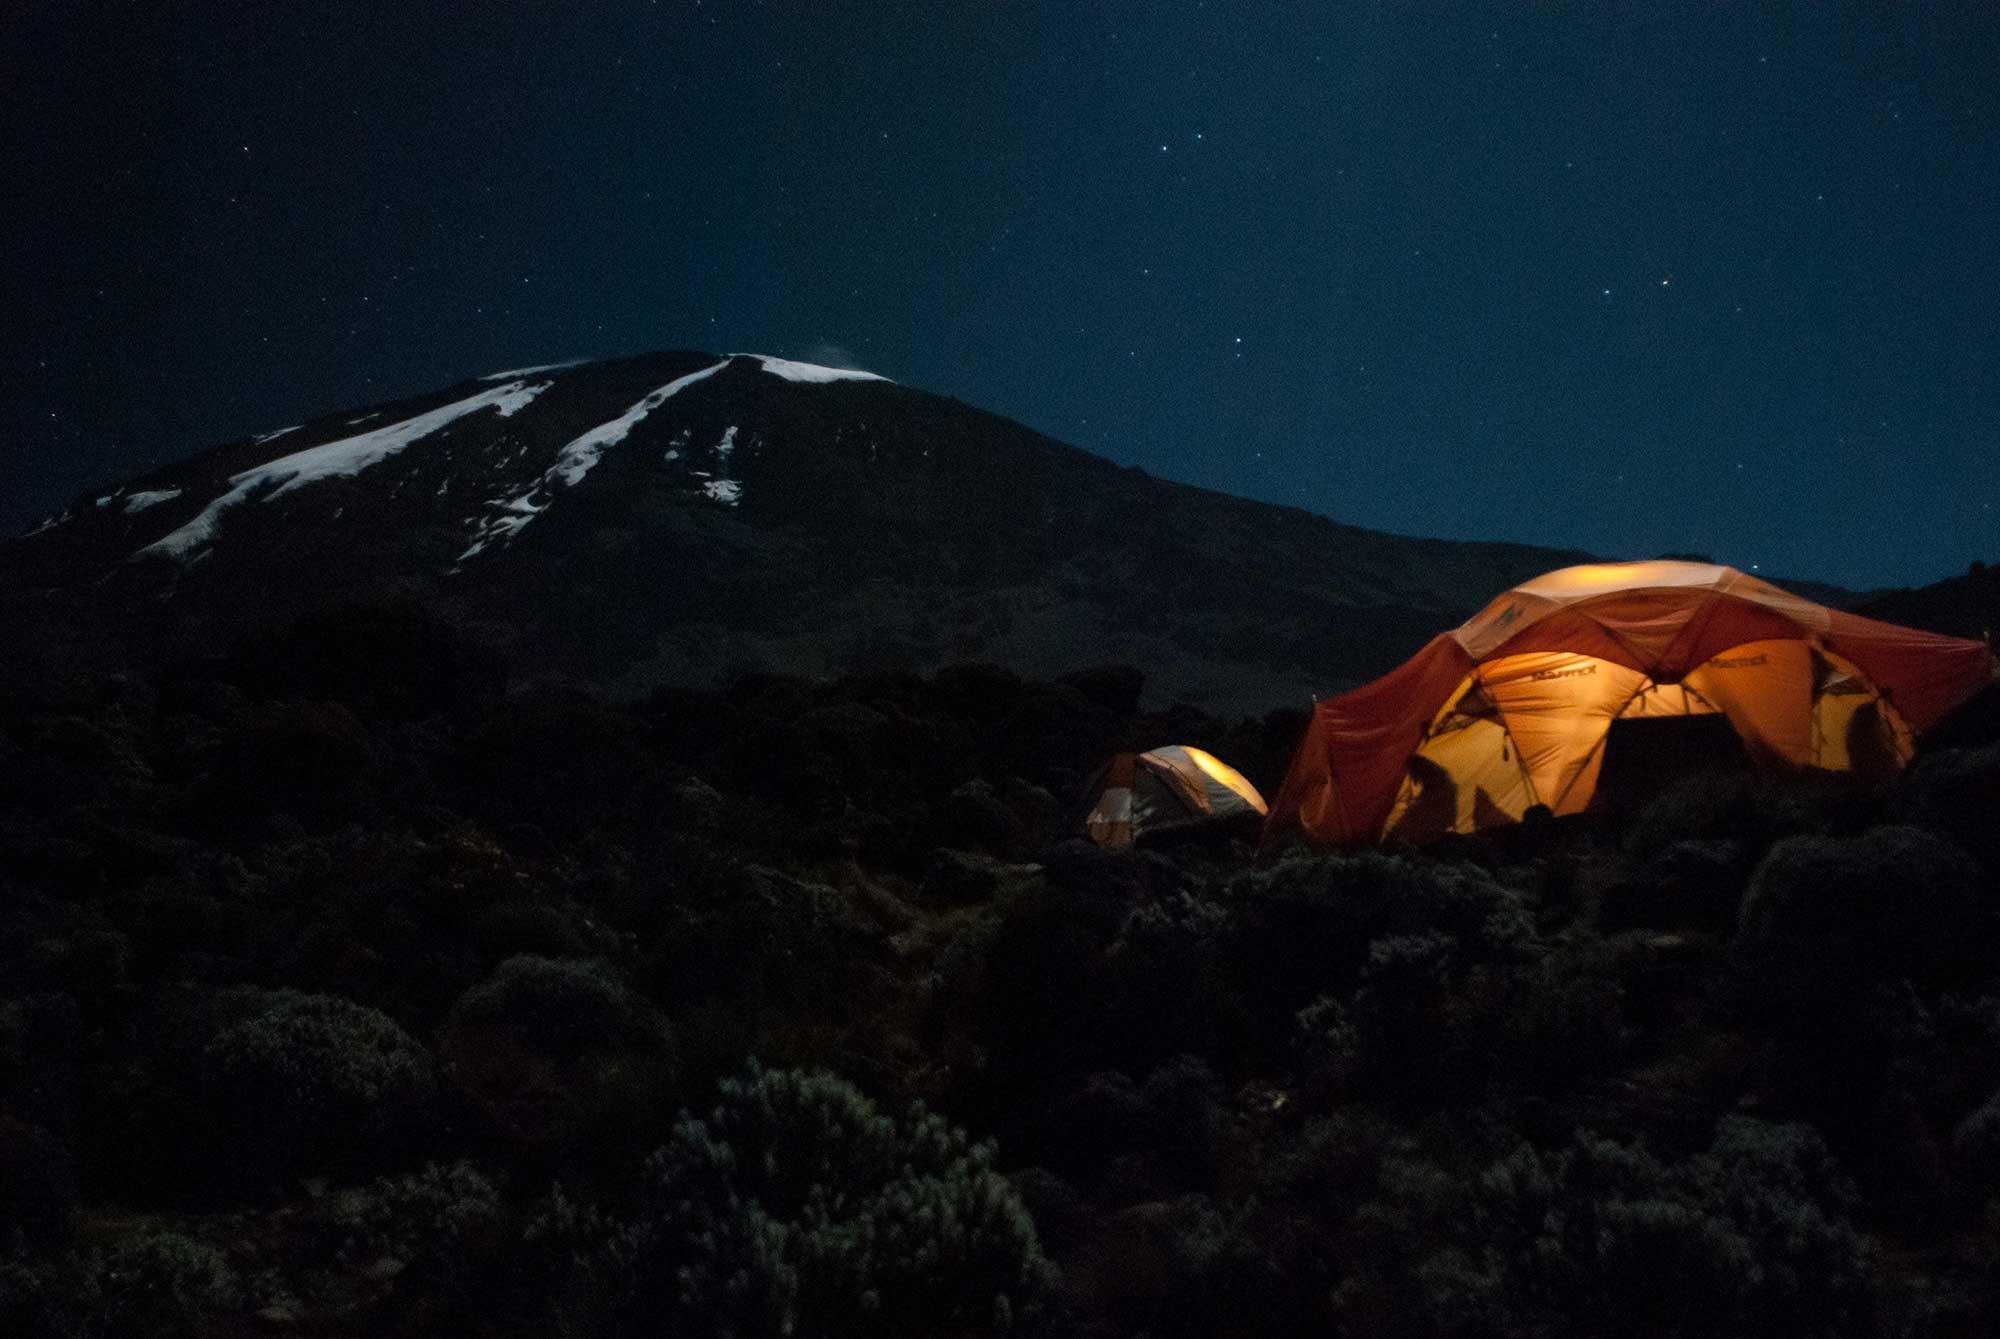 D5-22-mess-tent-before-kibo-at-night-karanga-camp-kilimanjaro.jpg